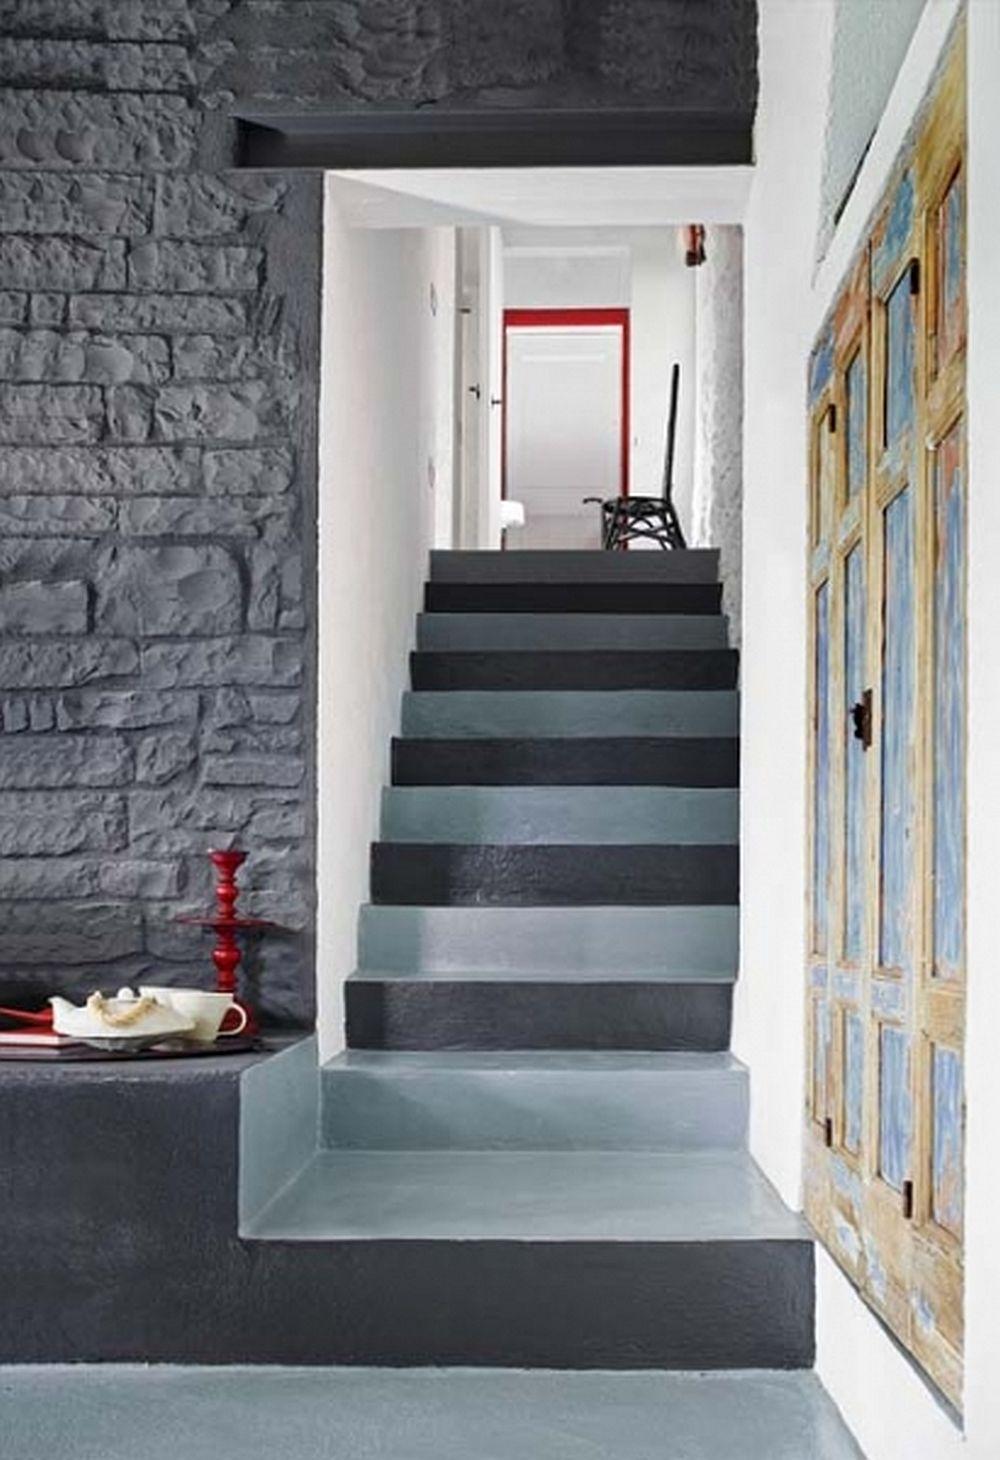 adelaparvu.com despre casa din piatra in stil eclectic, Umbria, designer Andrea Falkner, Foto Septimius Krogh (2)